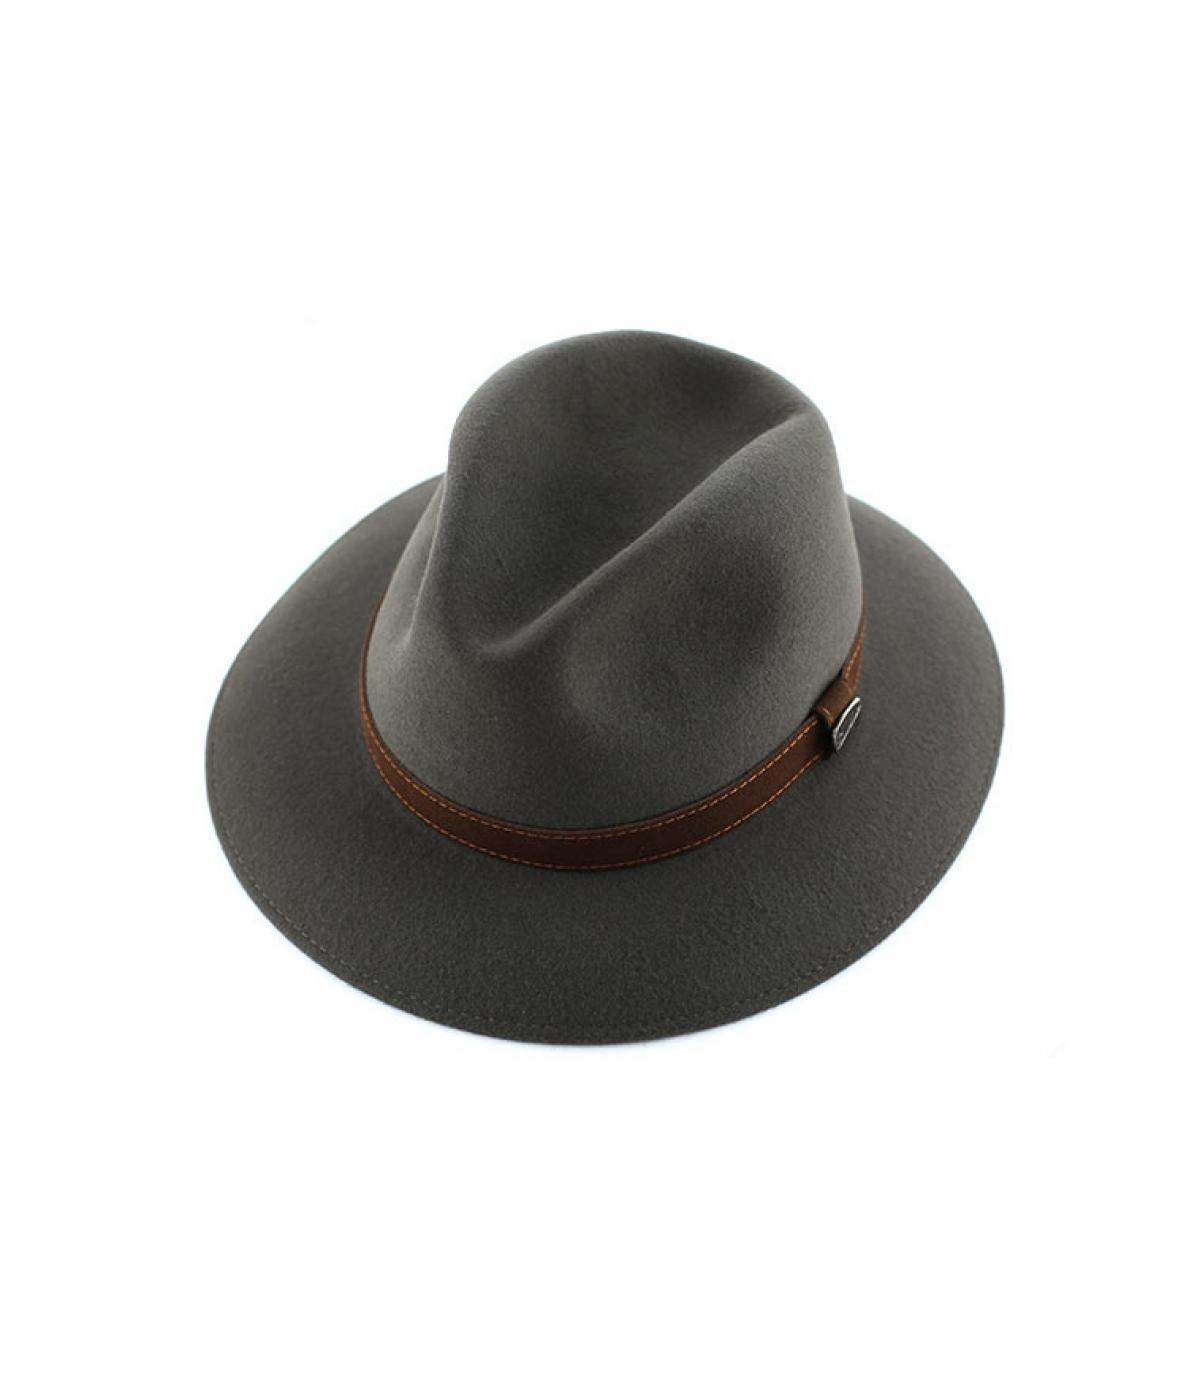 Details Alessandria grey fur felt hat - afbeeling 3